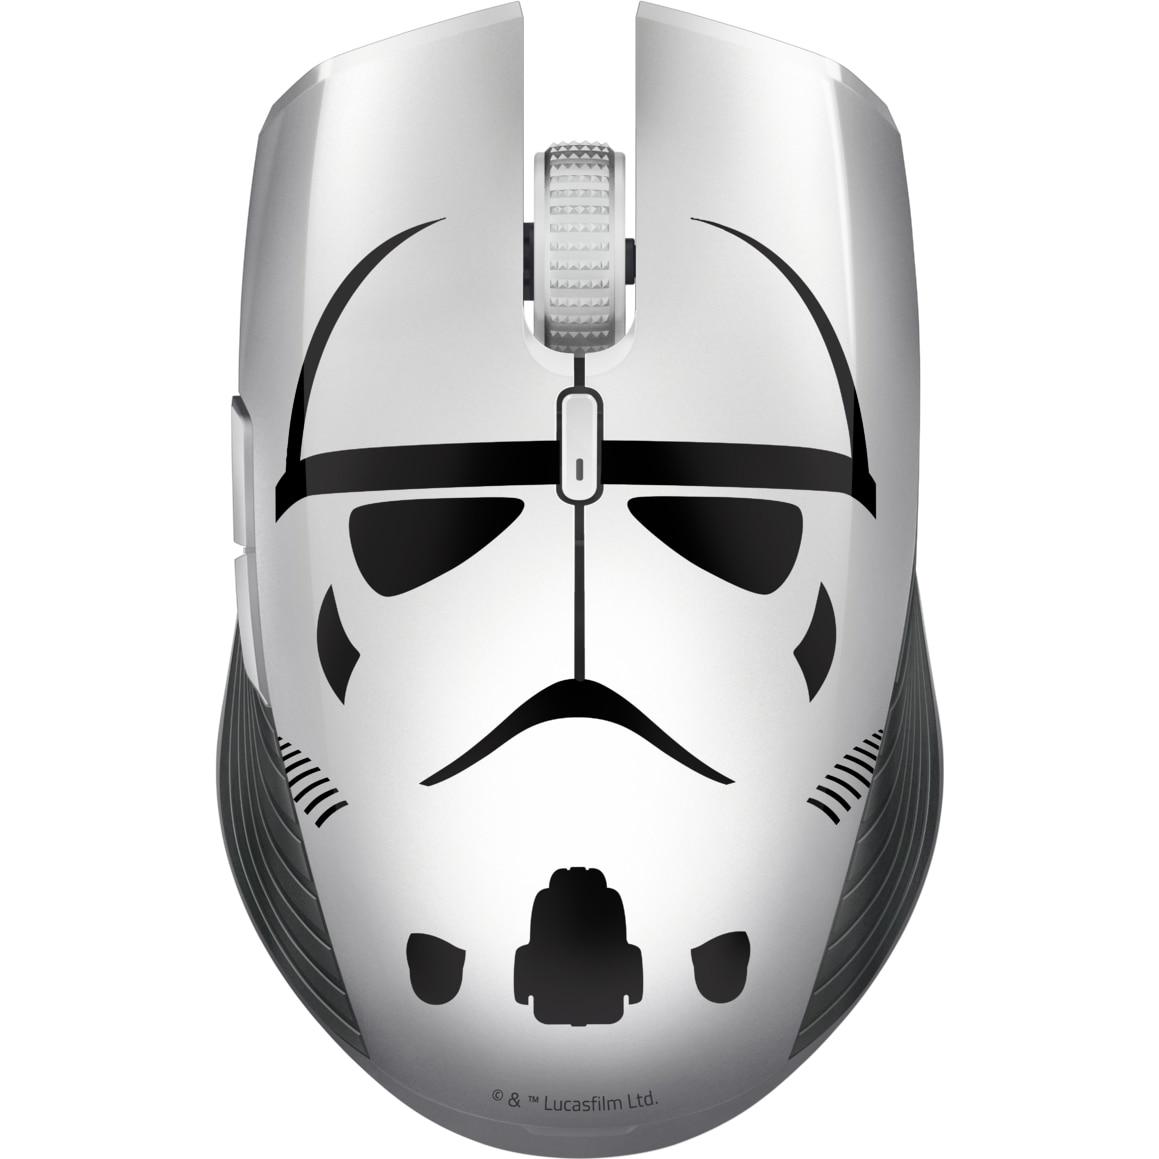 Fotografie Mouse gaming wireless Razer Atheris, Bluetooth&2.4GHz, Stormtrooper Edition